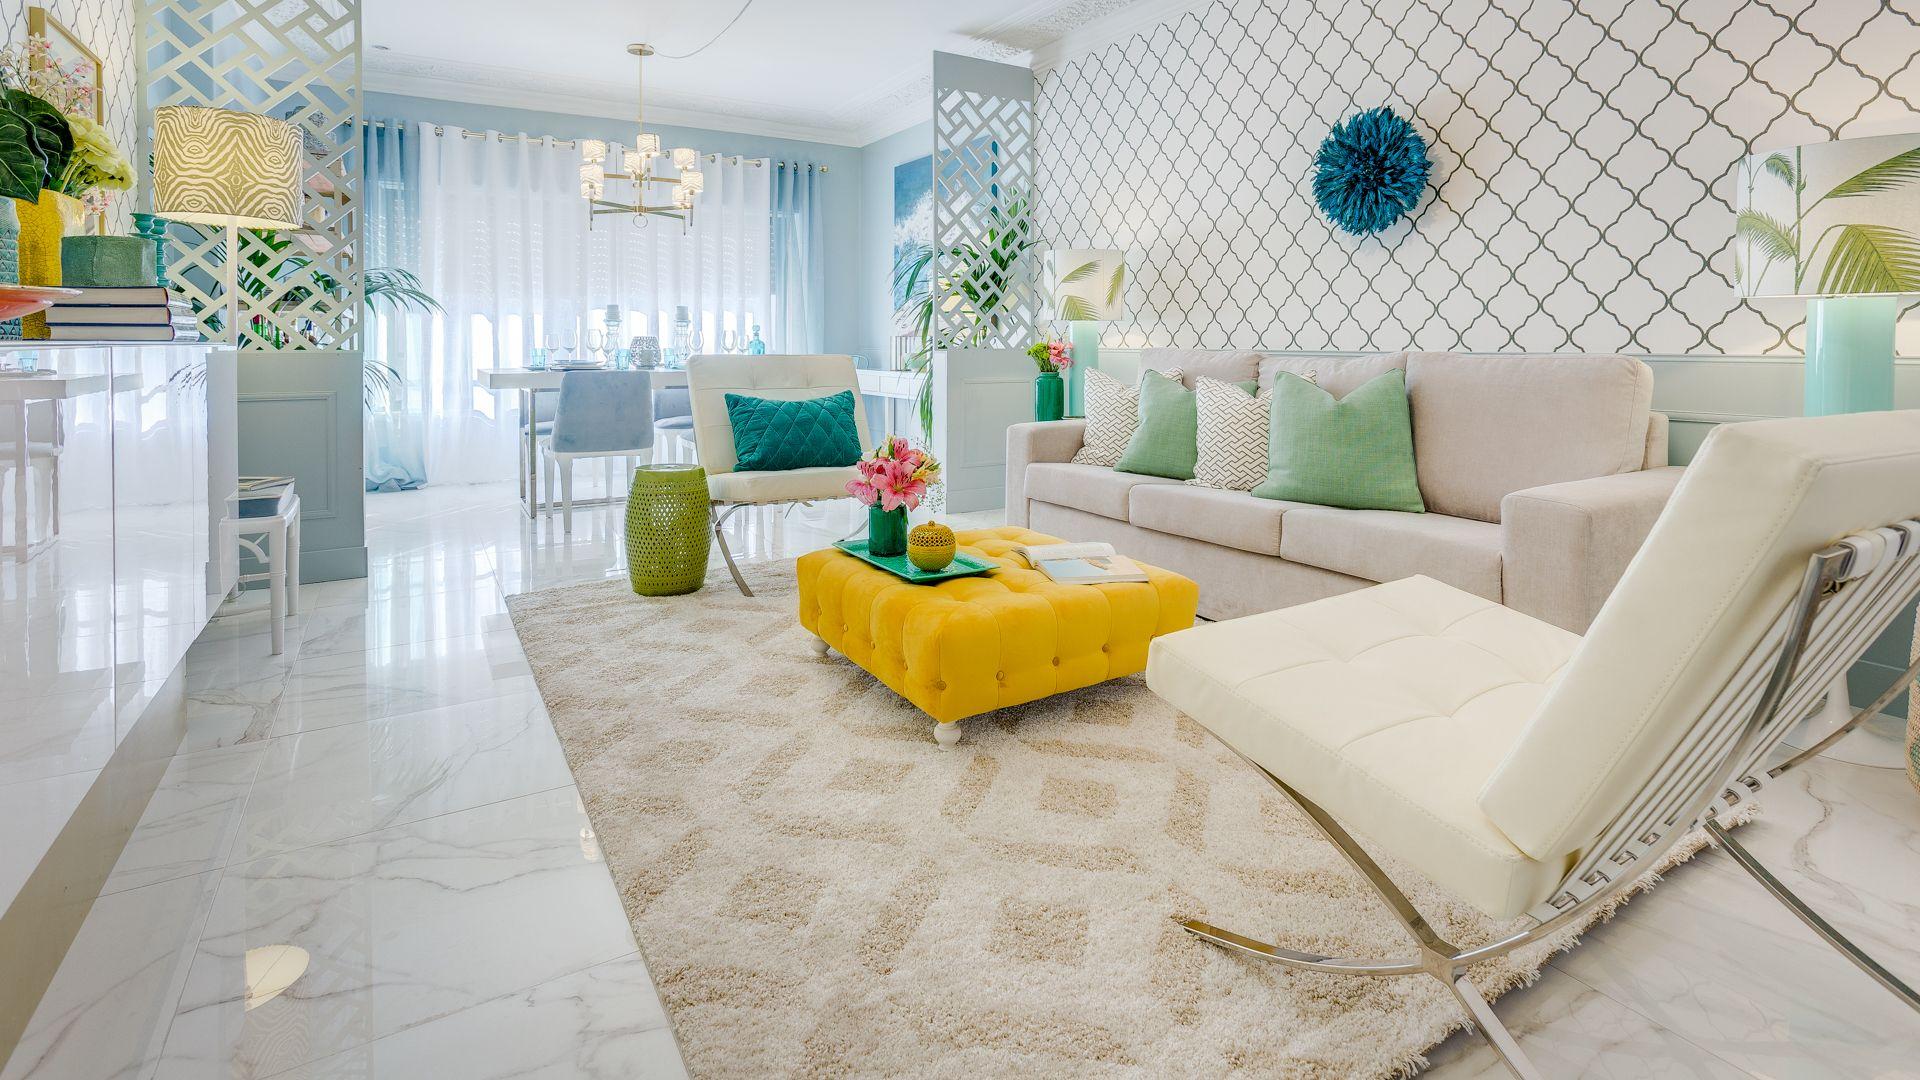 ana antunes sala de estar living room spring colors rh pinterest com